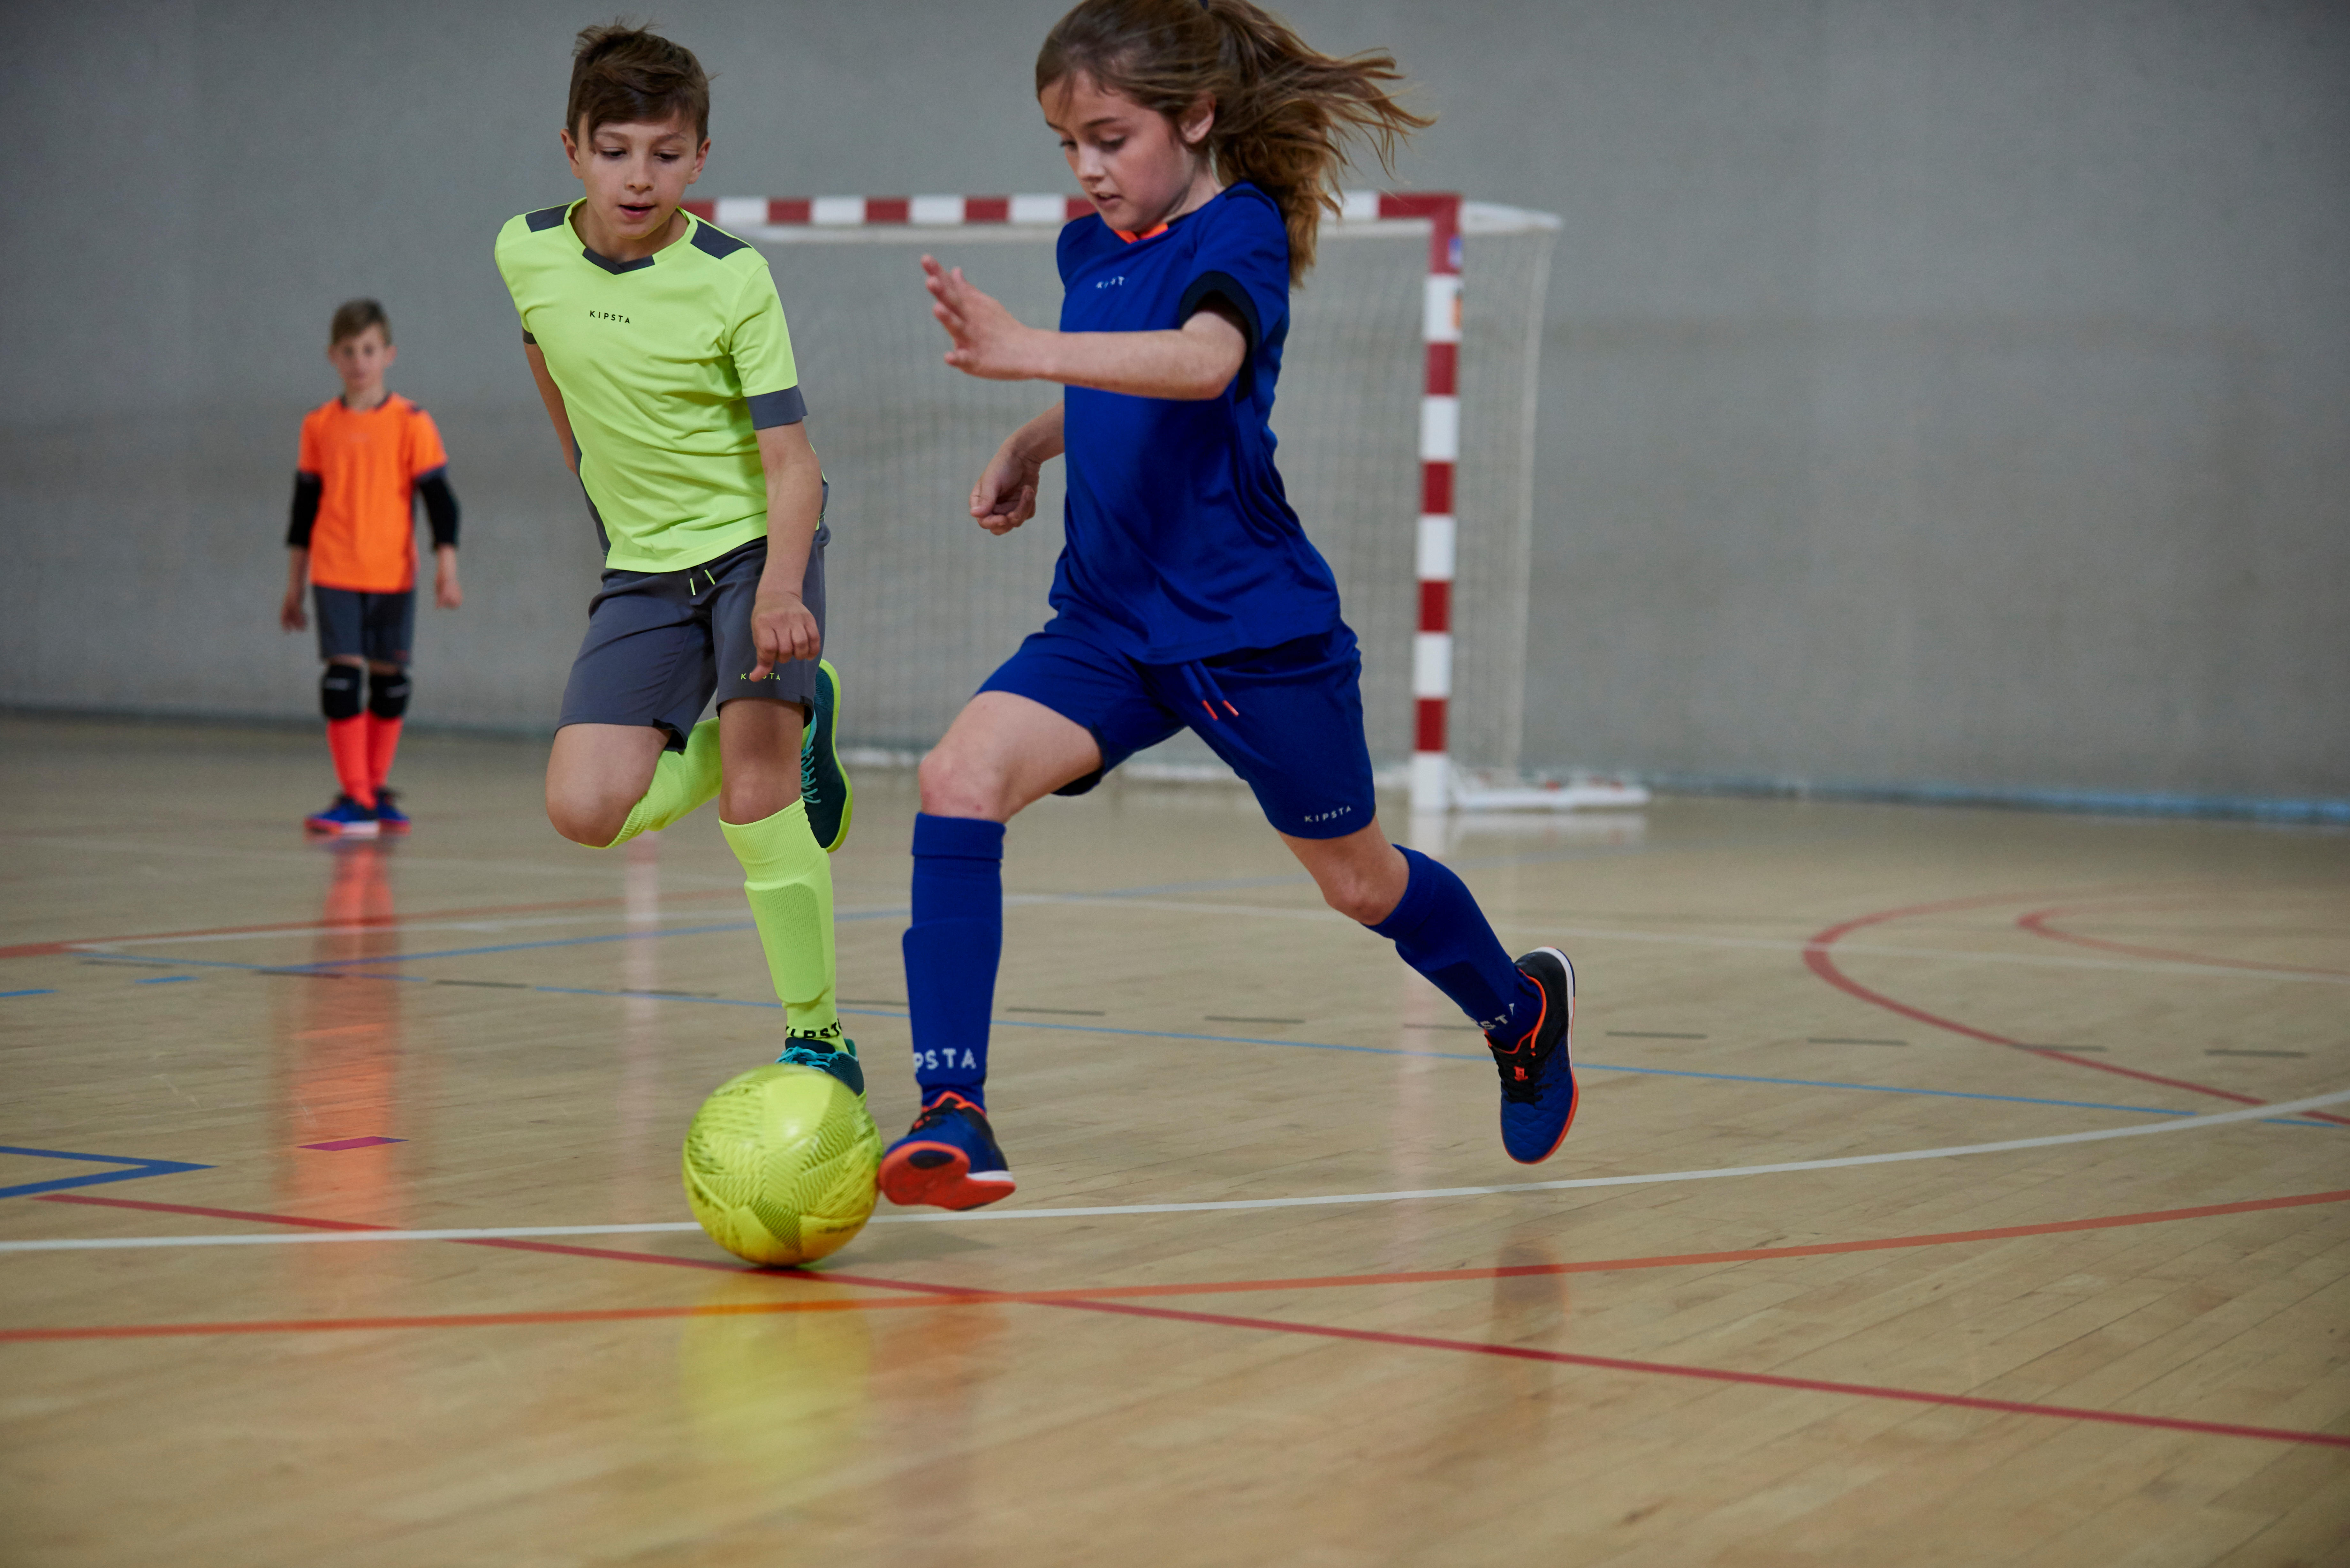 shoot pratique futsal enfant ah18[8392534cc,8496874cc,8496873cc,8392255cc,8407405cc,8497267cc]tc.jpg[-1_-1xoxarxbg(white)]